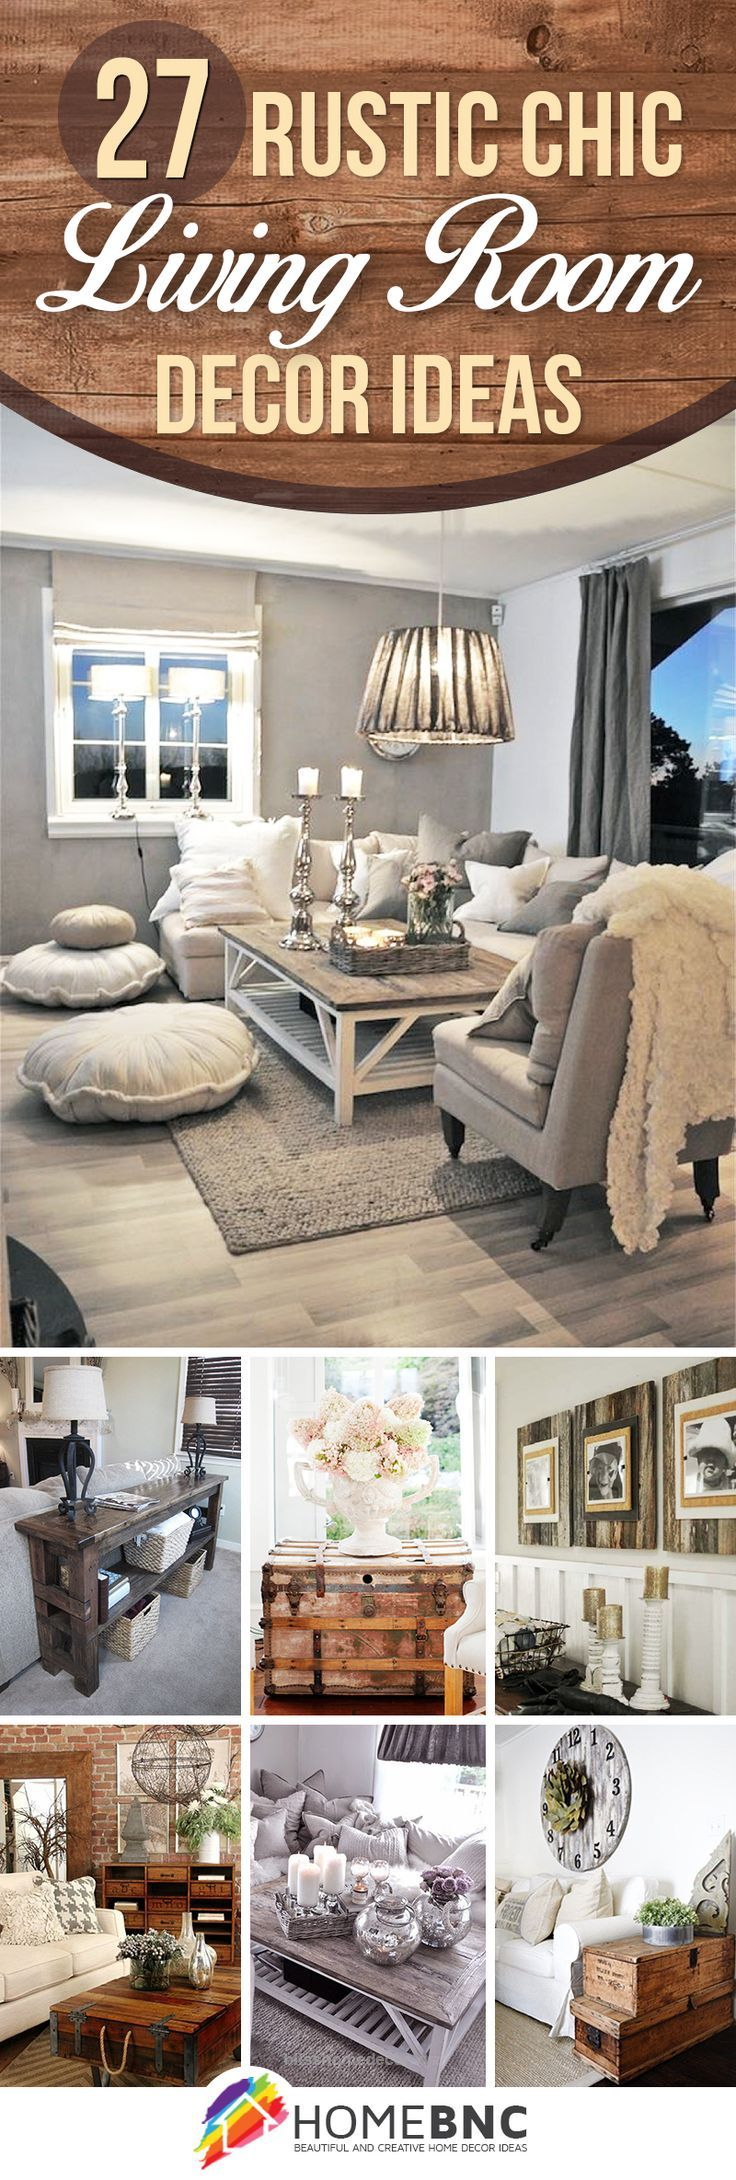 Rustic Chic Living Room Ideas 449 best